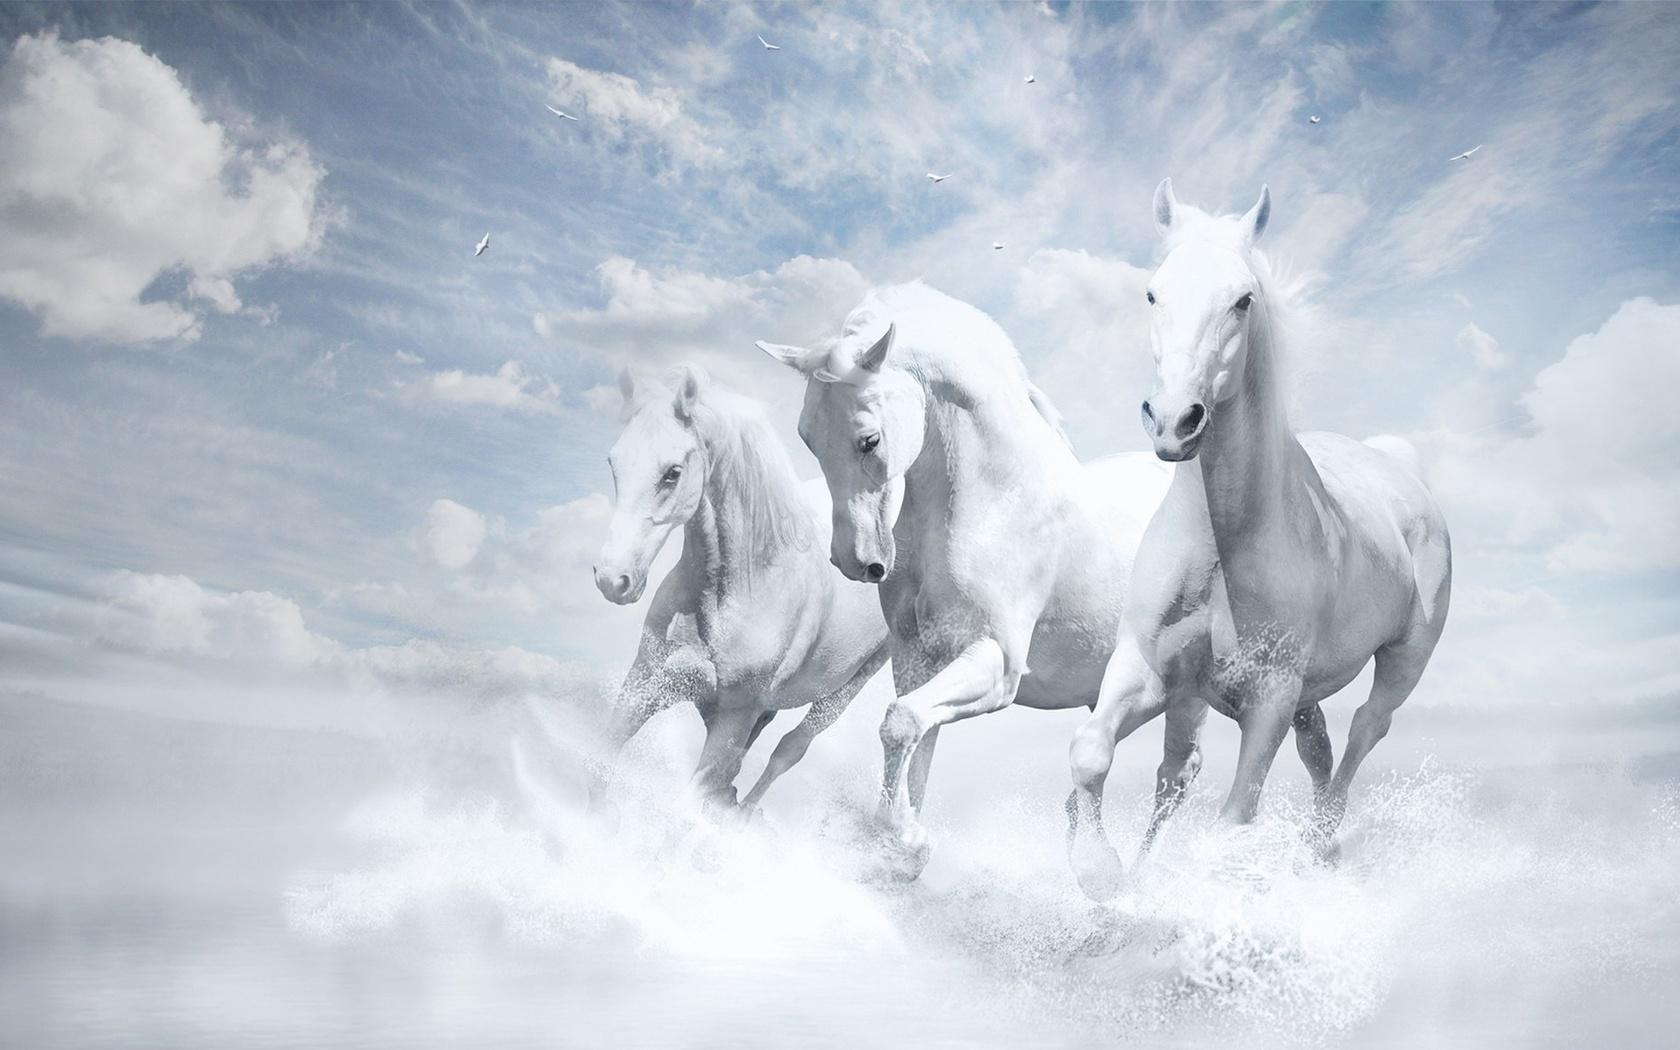 фэнтези, арт, картина, лошади, трио, белый фон, облака